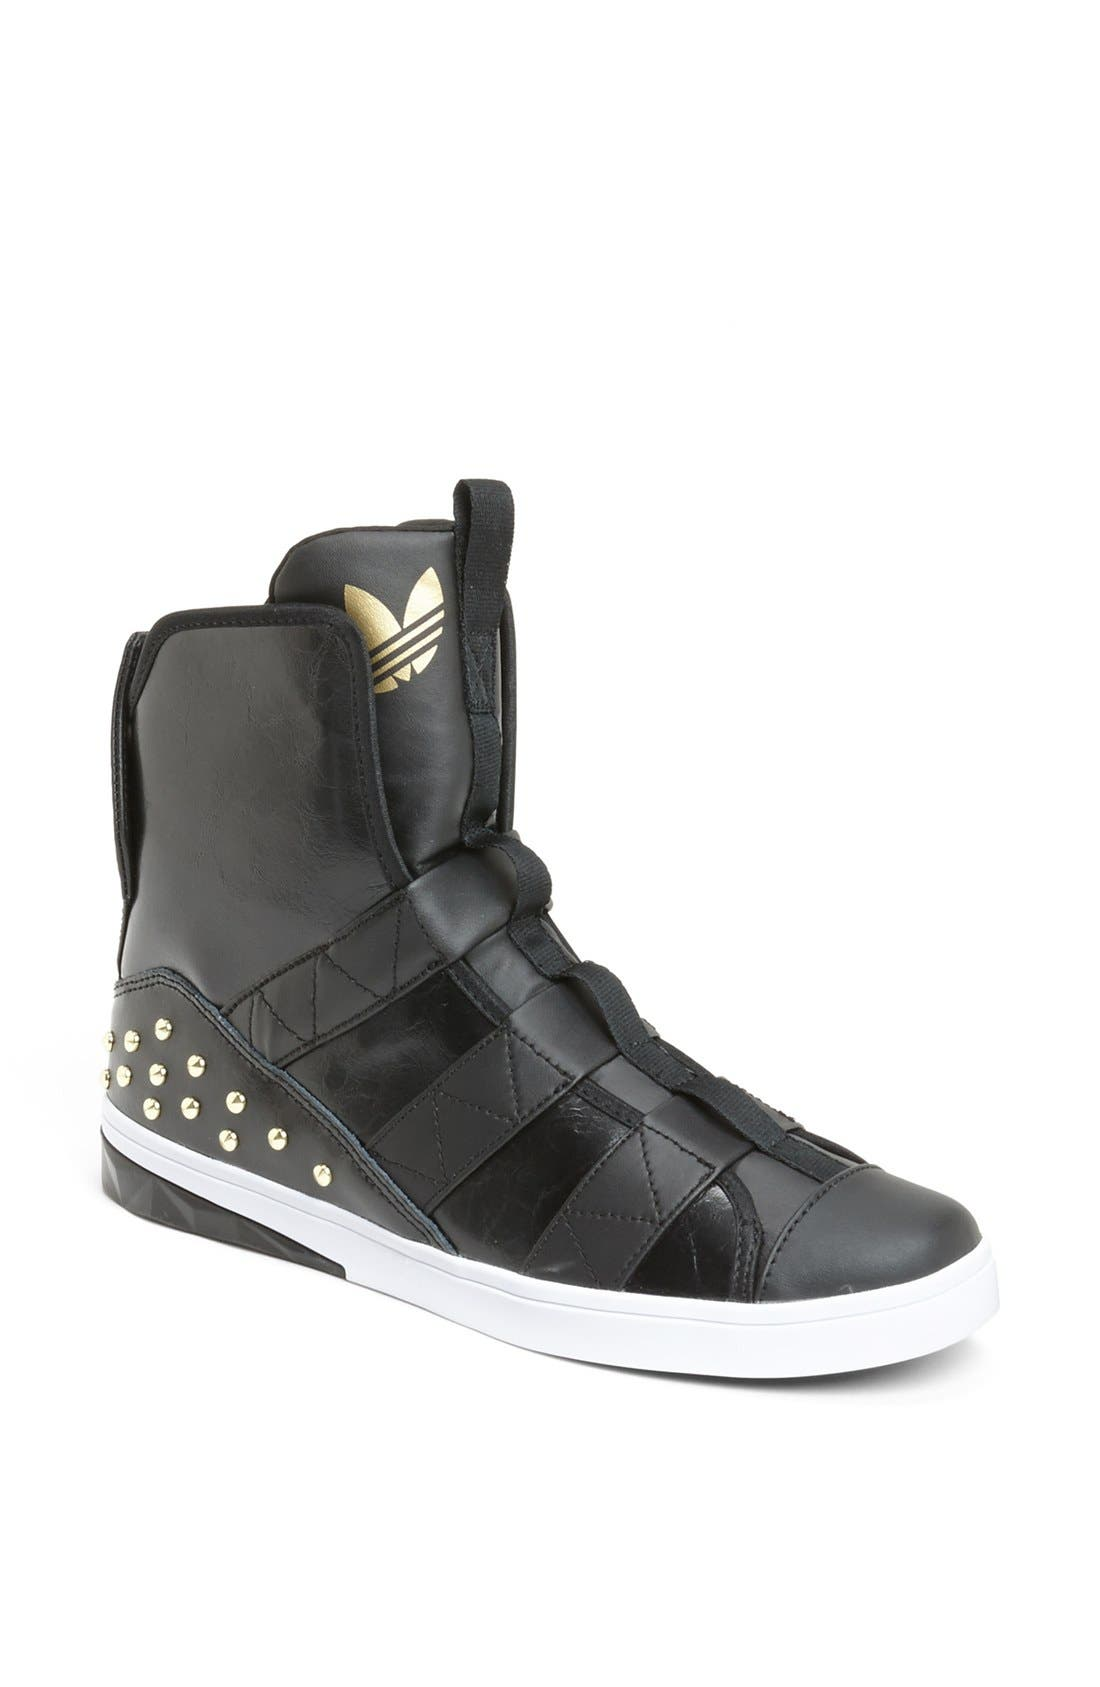 Alternate Image 1 Selected - adidas 'Chic High' Sneaker (Women)